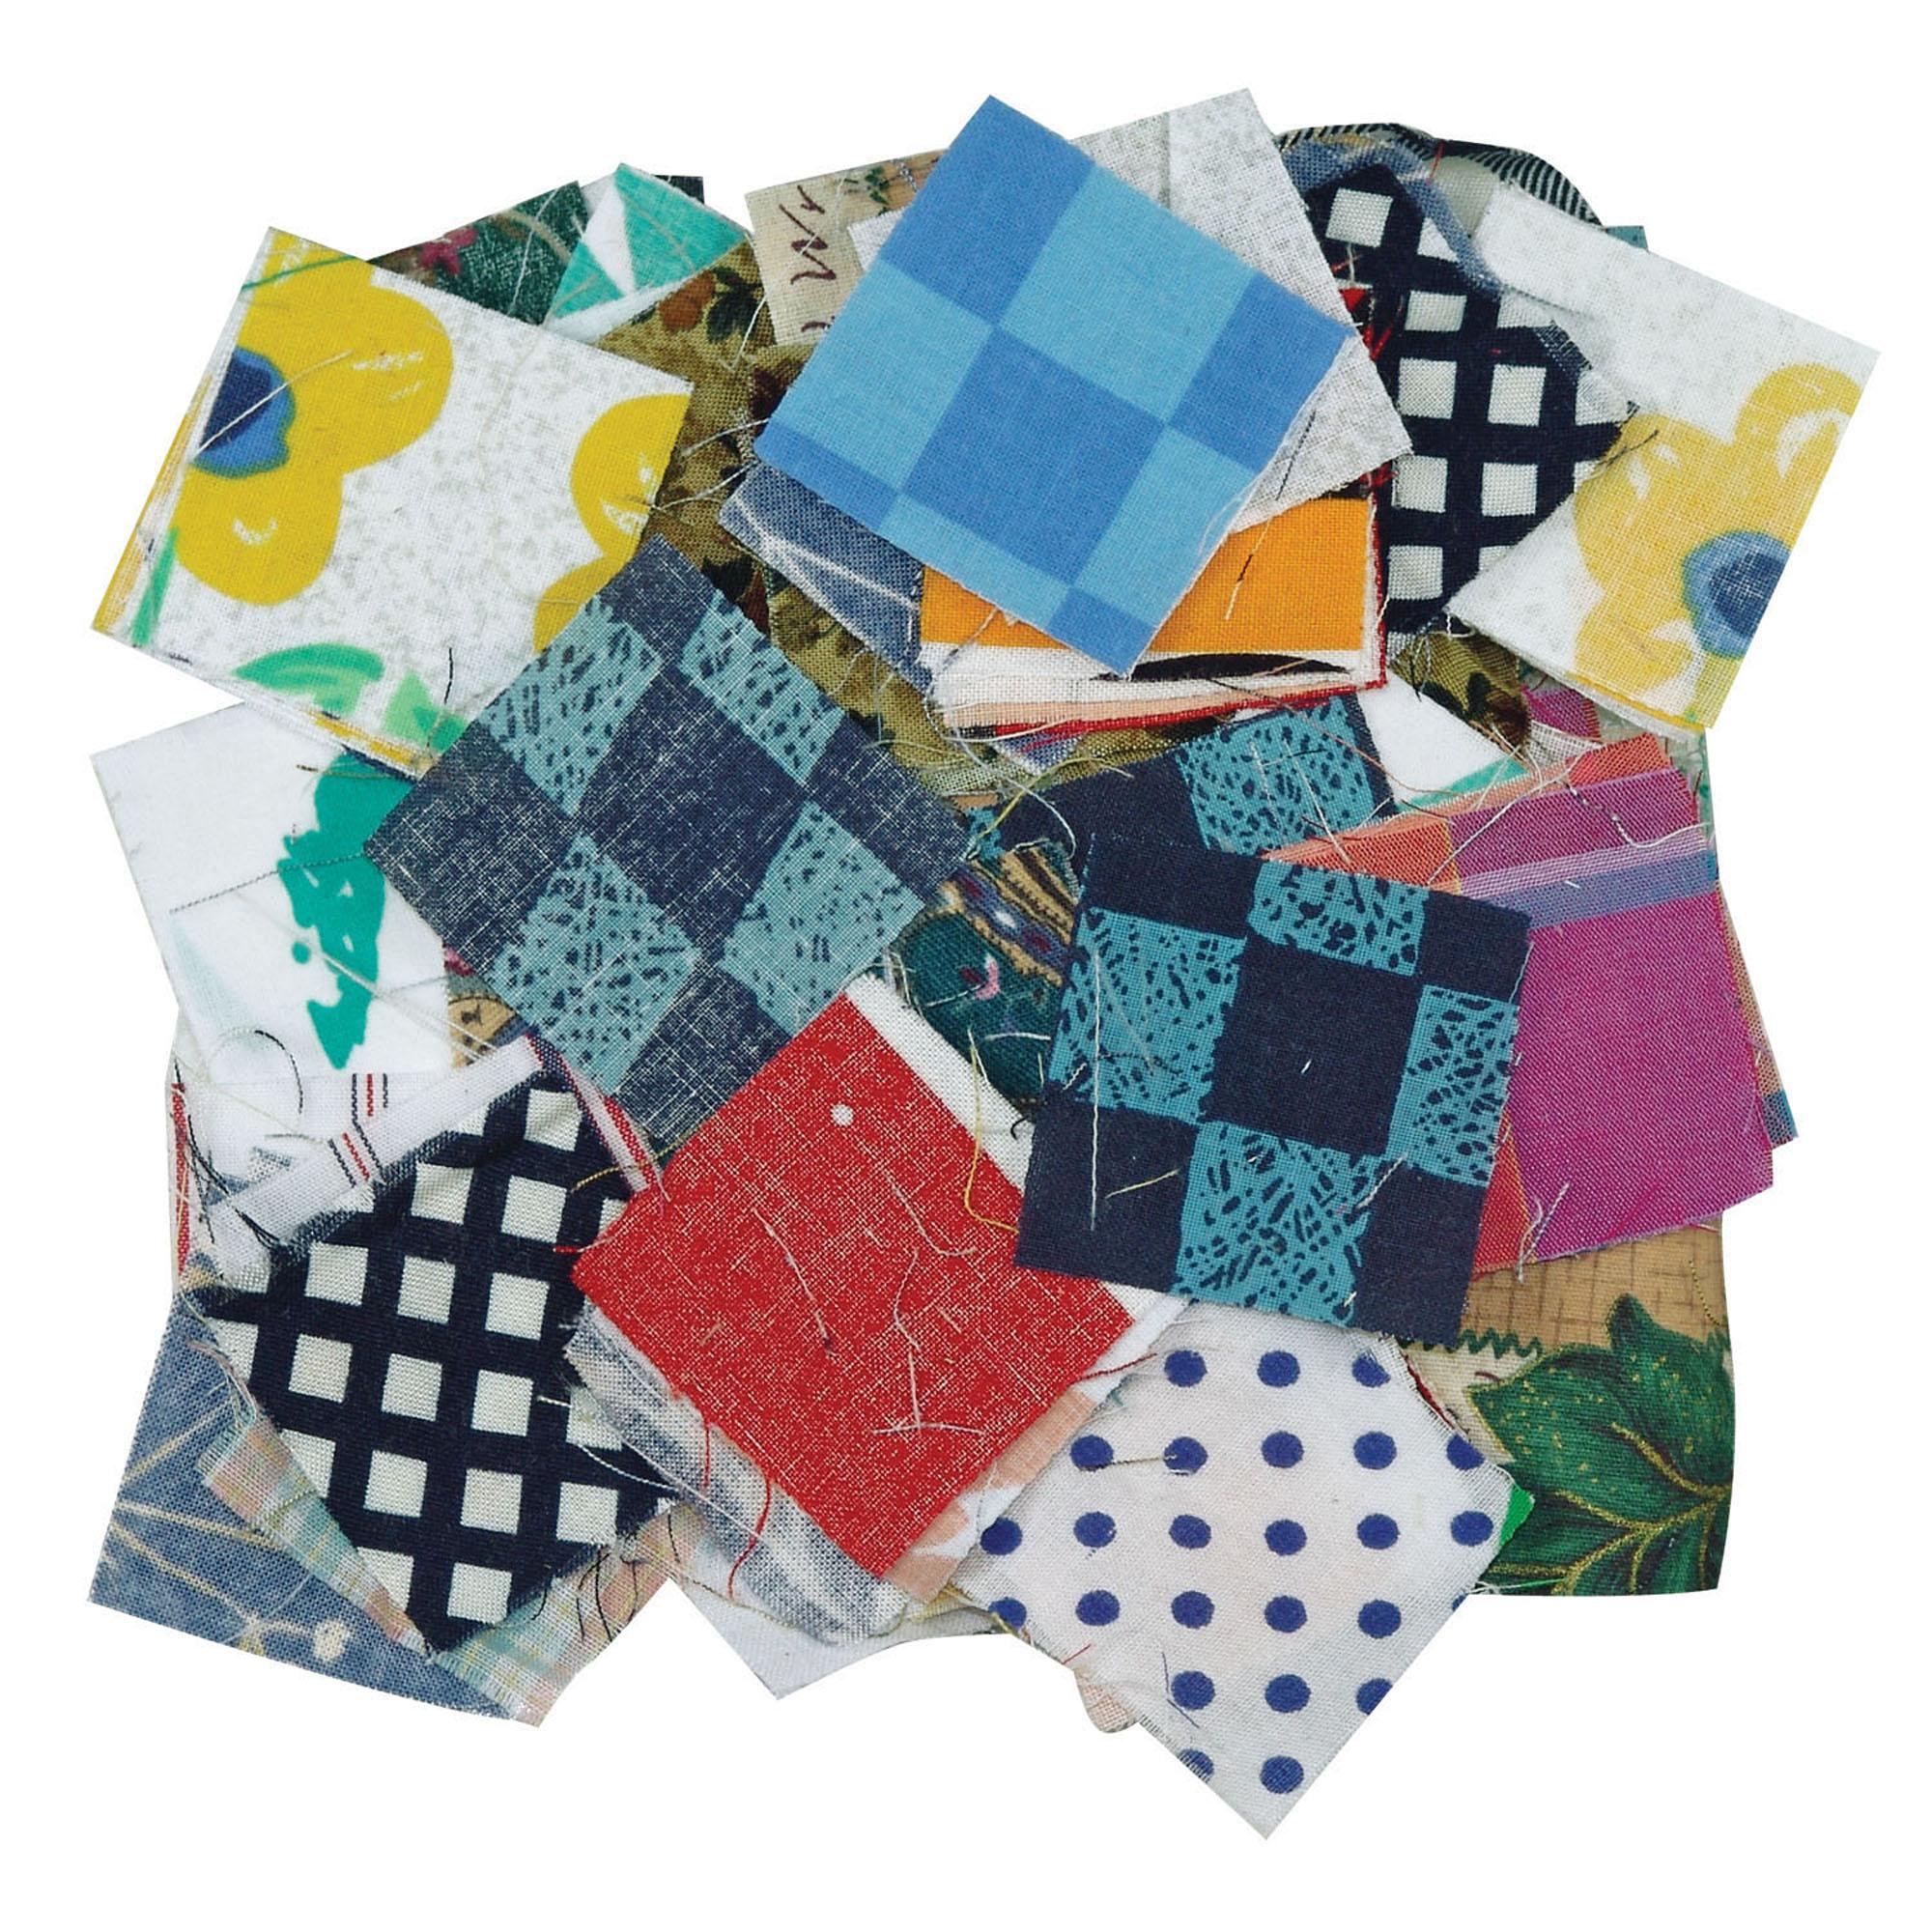 Roylco® Fabric Mosaics, 400 Pieces